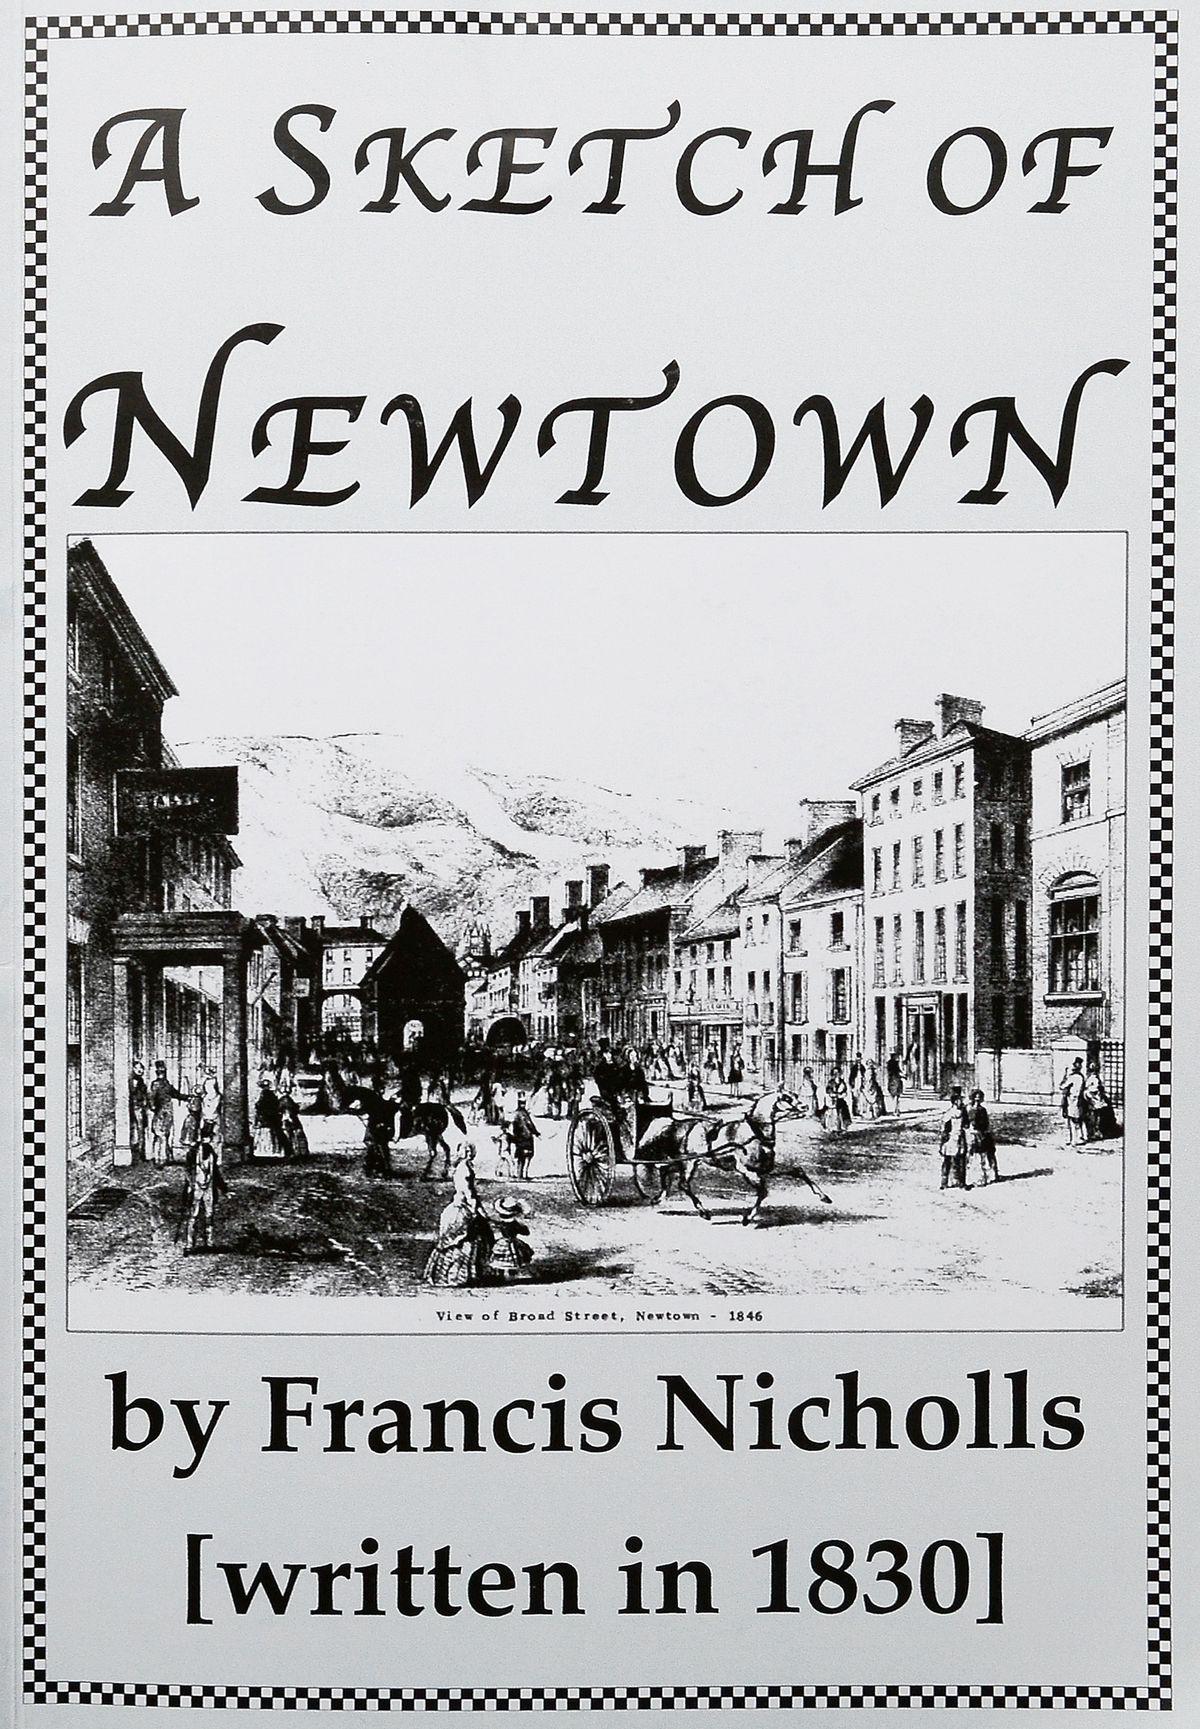 A Sketch of Newtown